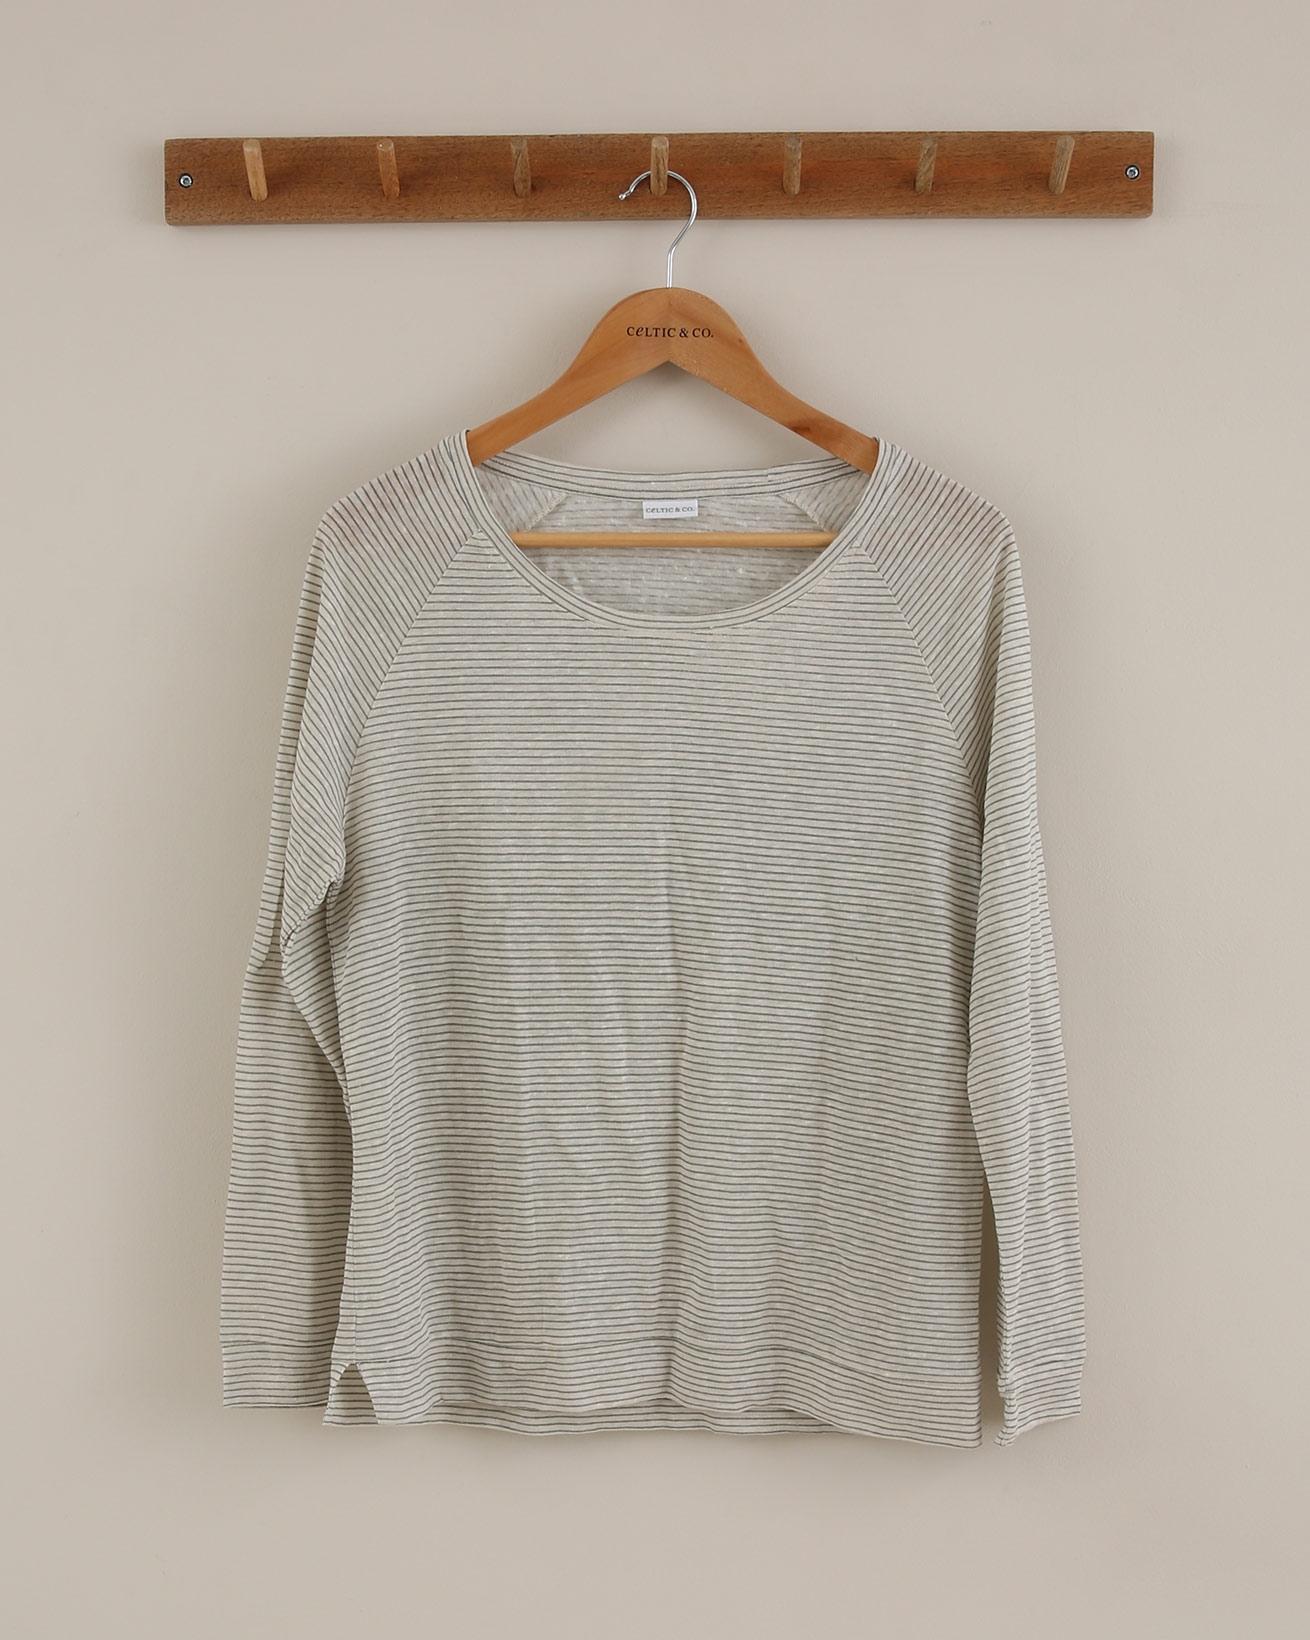 Linen Sweatshirt - Size 14 - Sage Ecru - 1912